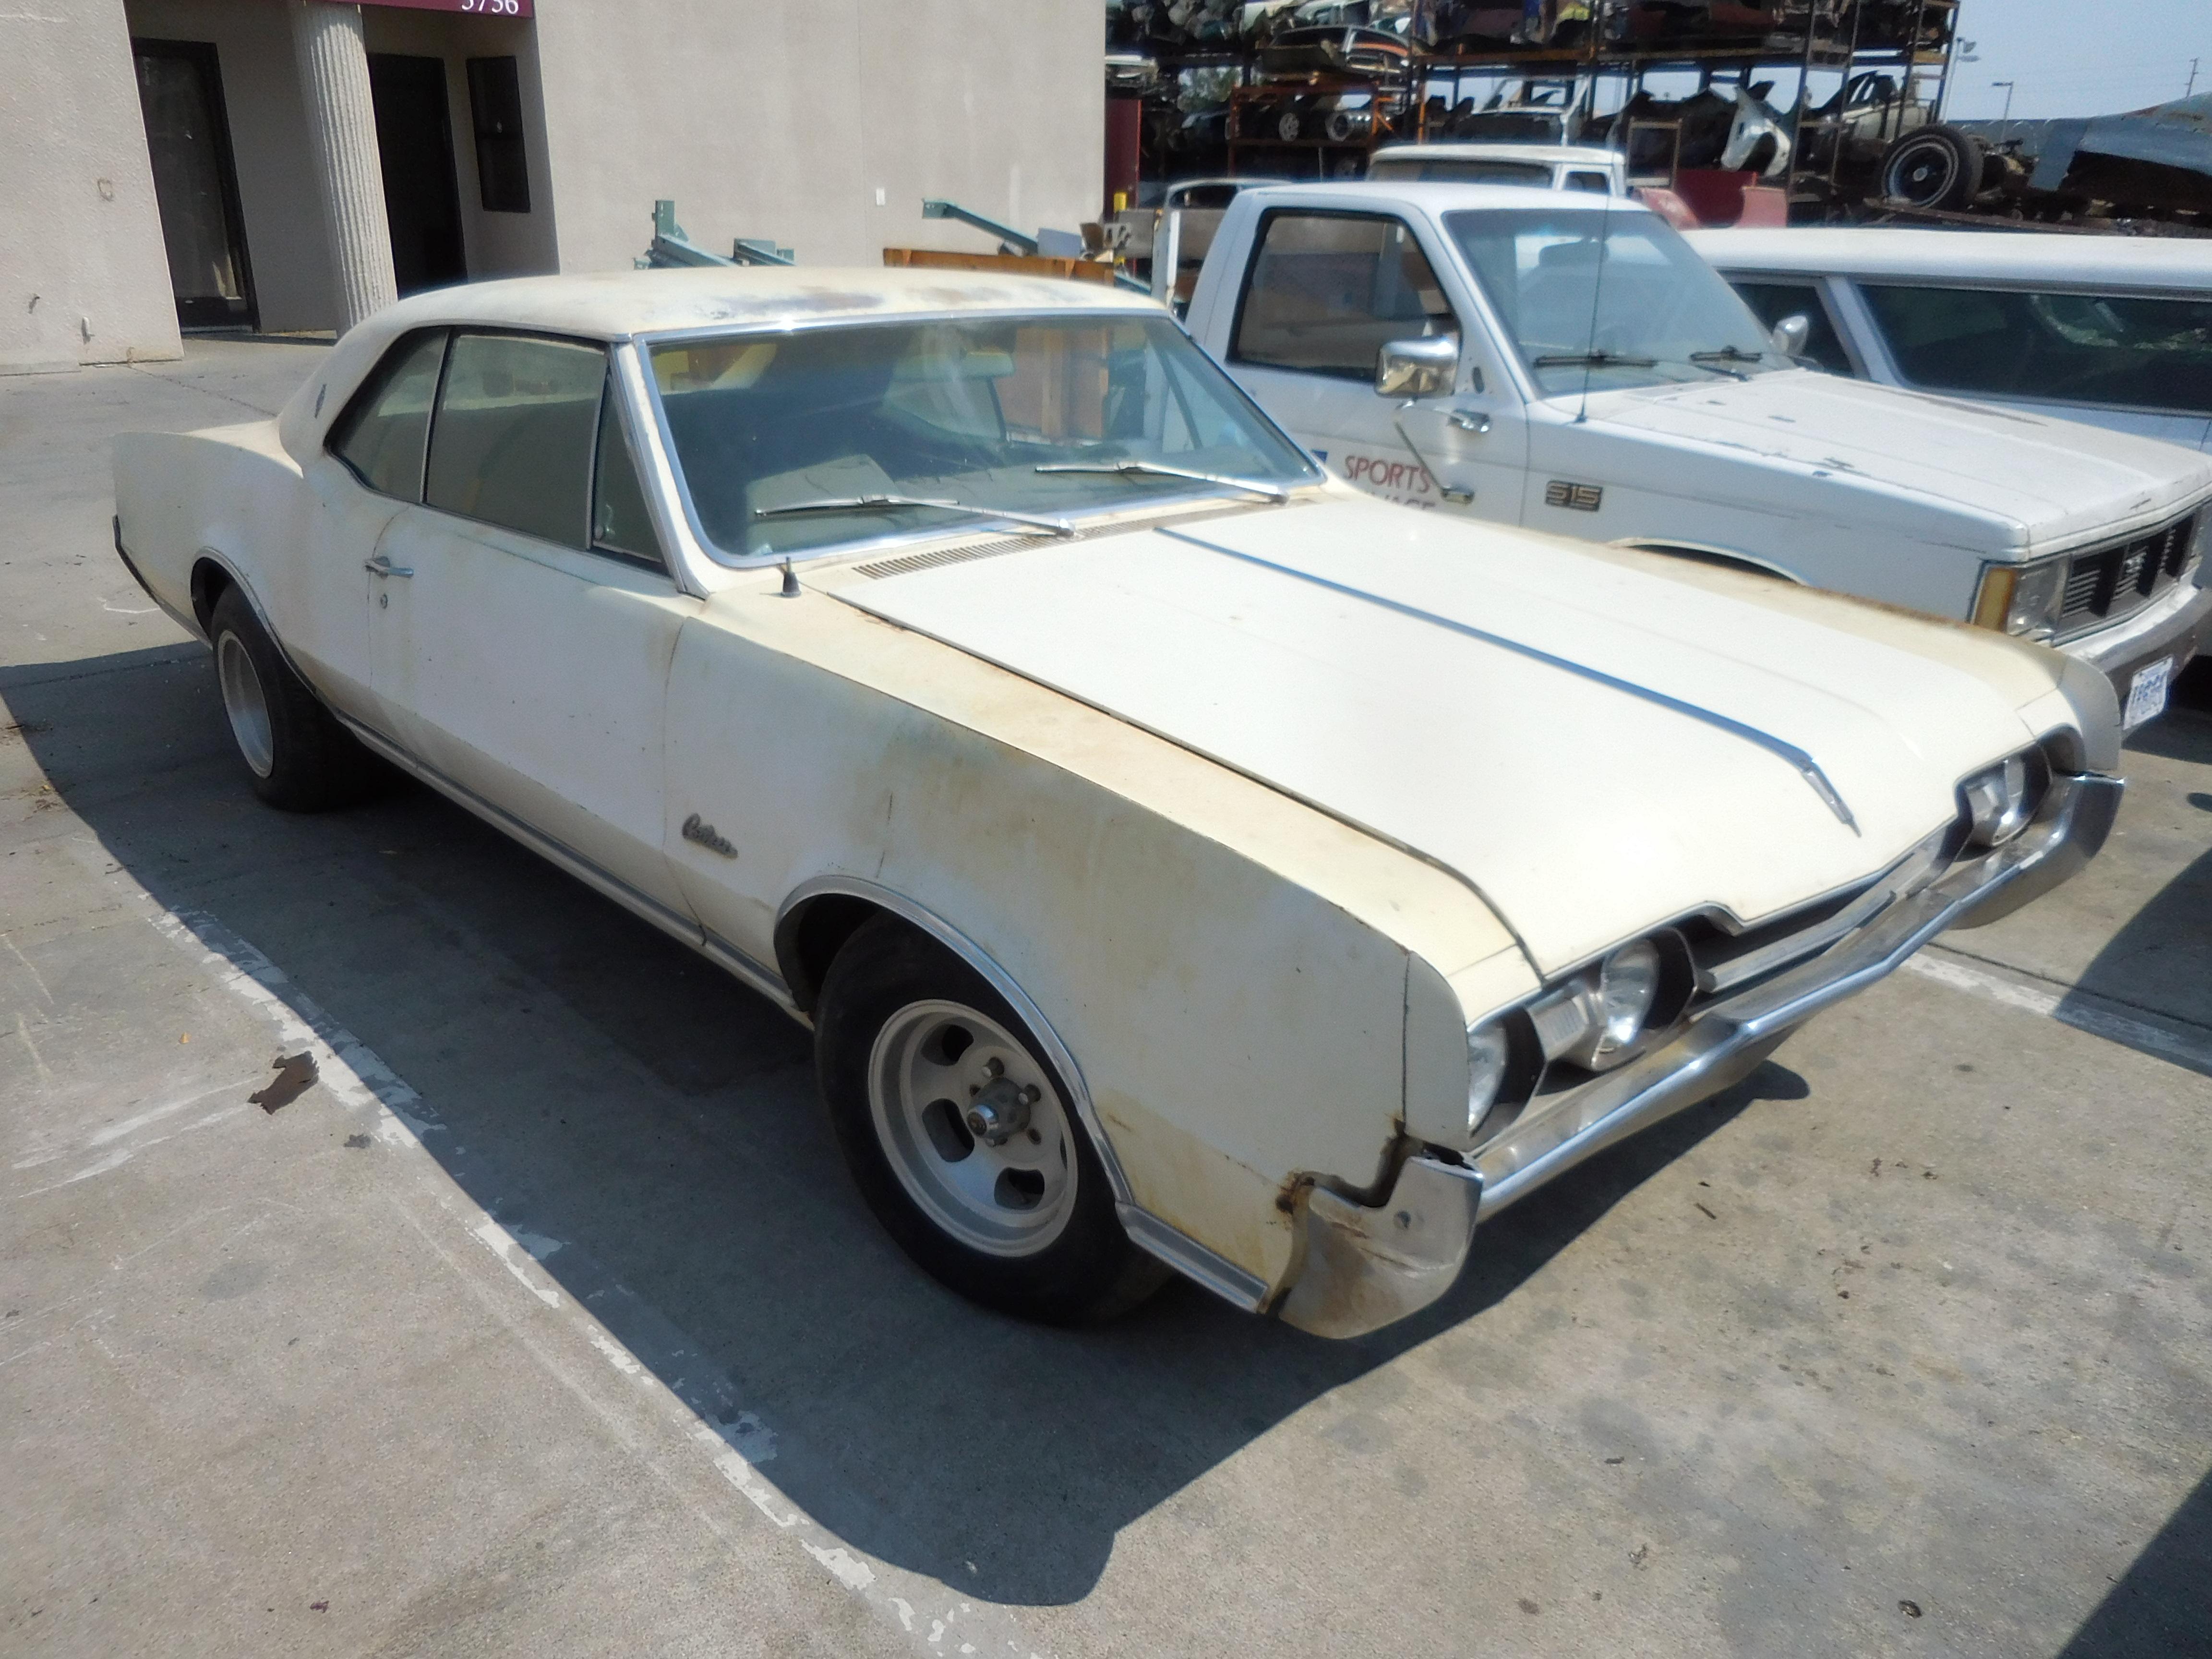 1967, Oldsmobile, Cutlass, hood, door, deck, lid,trunk, bumper, quarter, panel,roof, cowl, frame, suspension, bucket, seats, console,